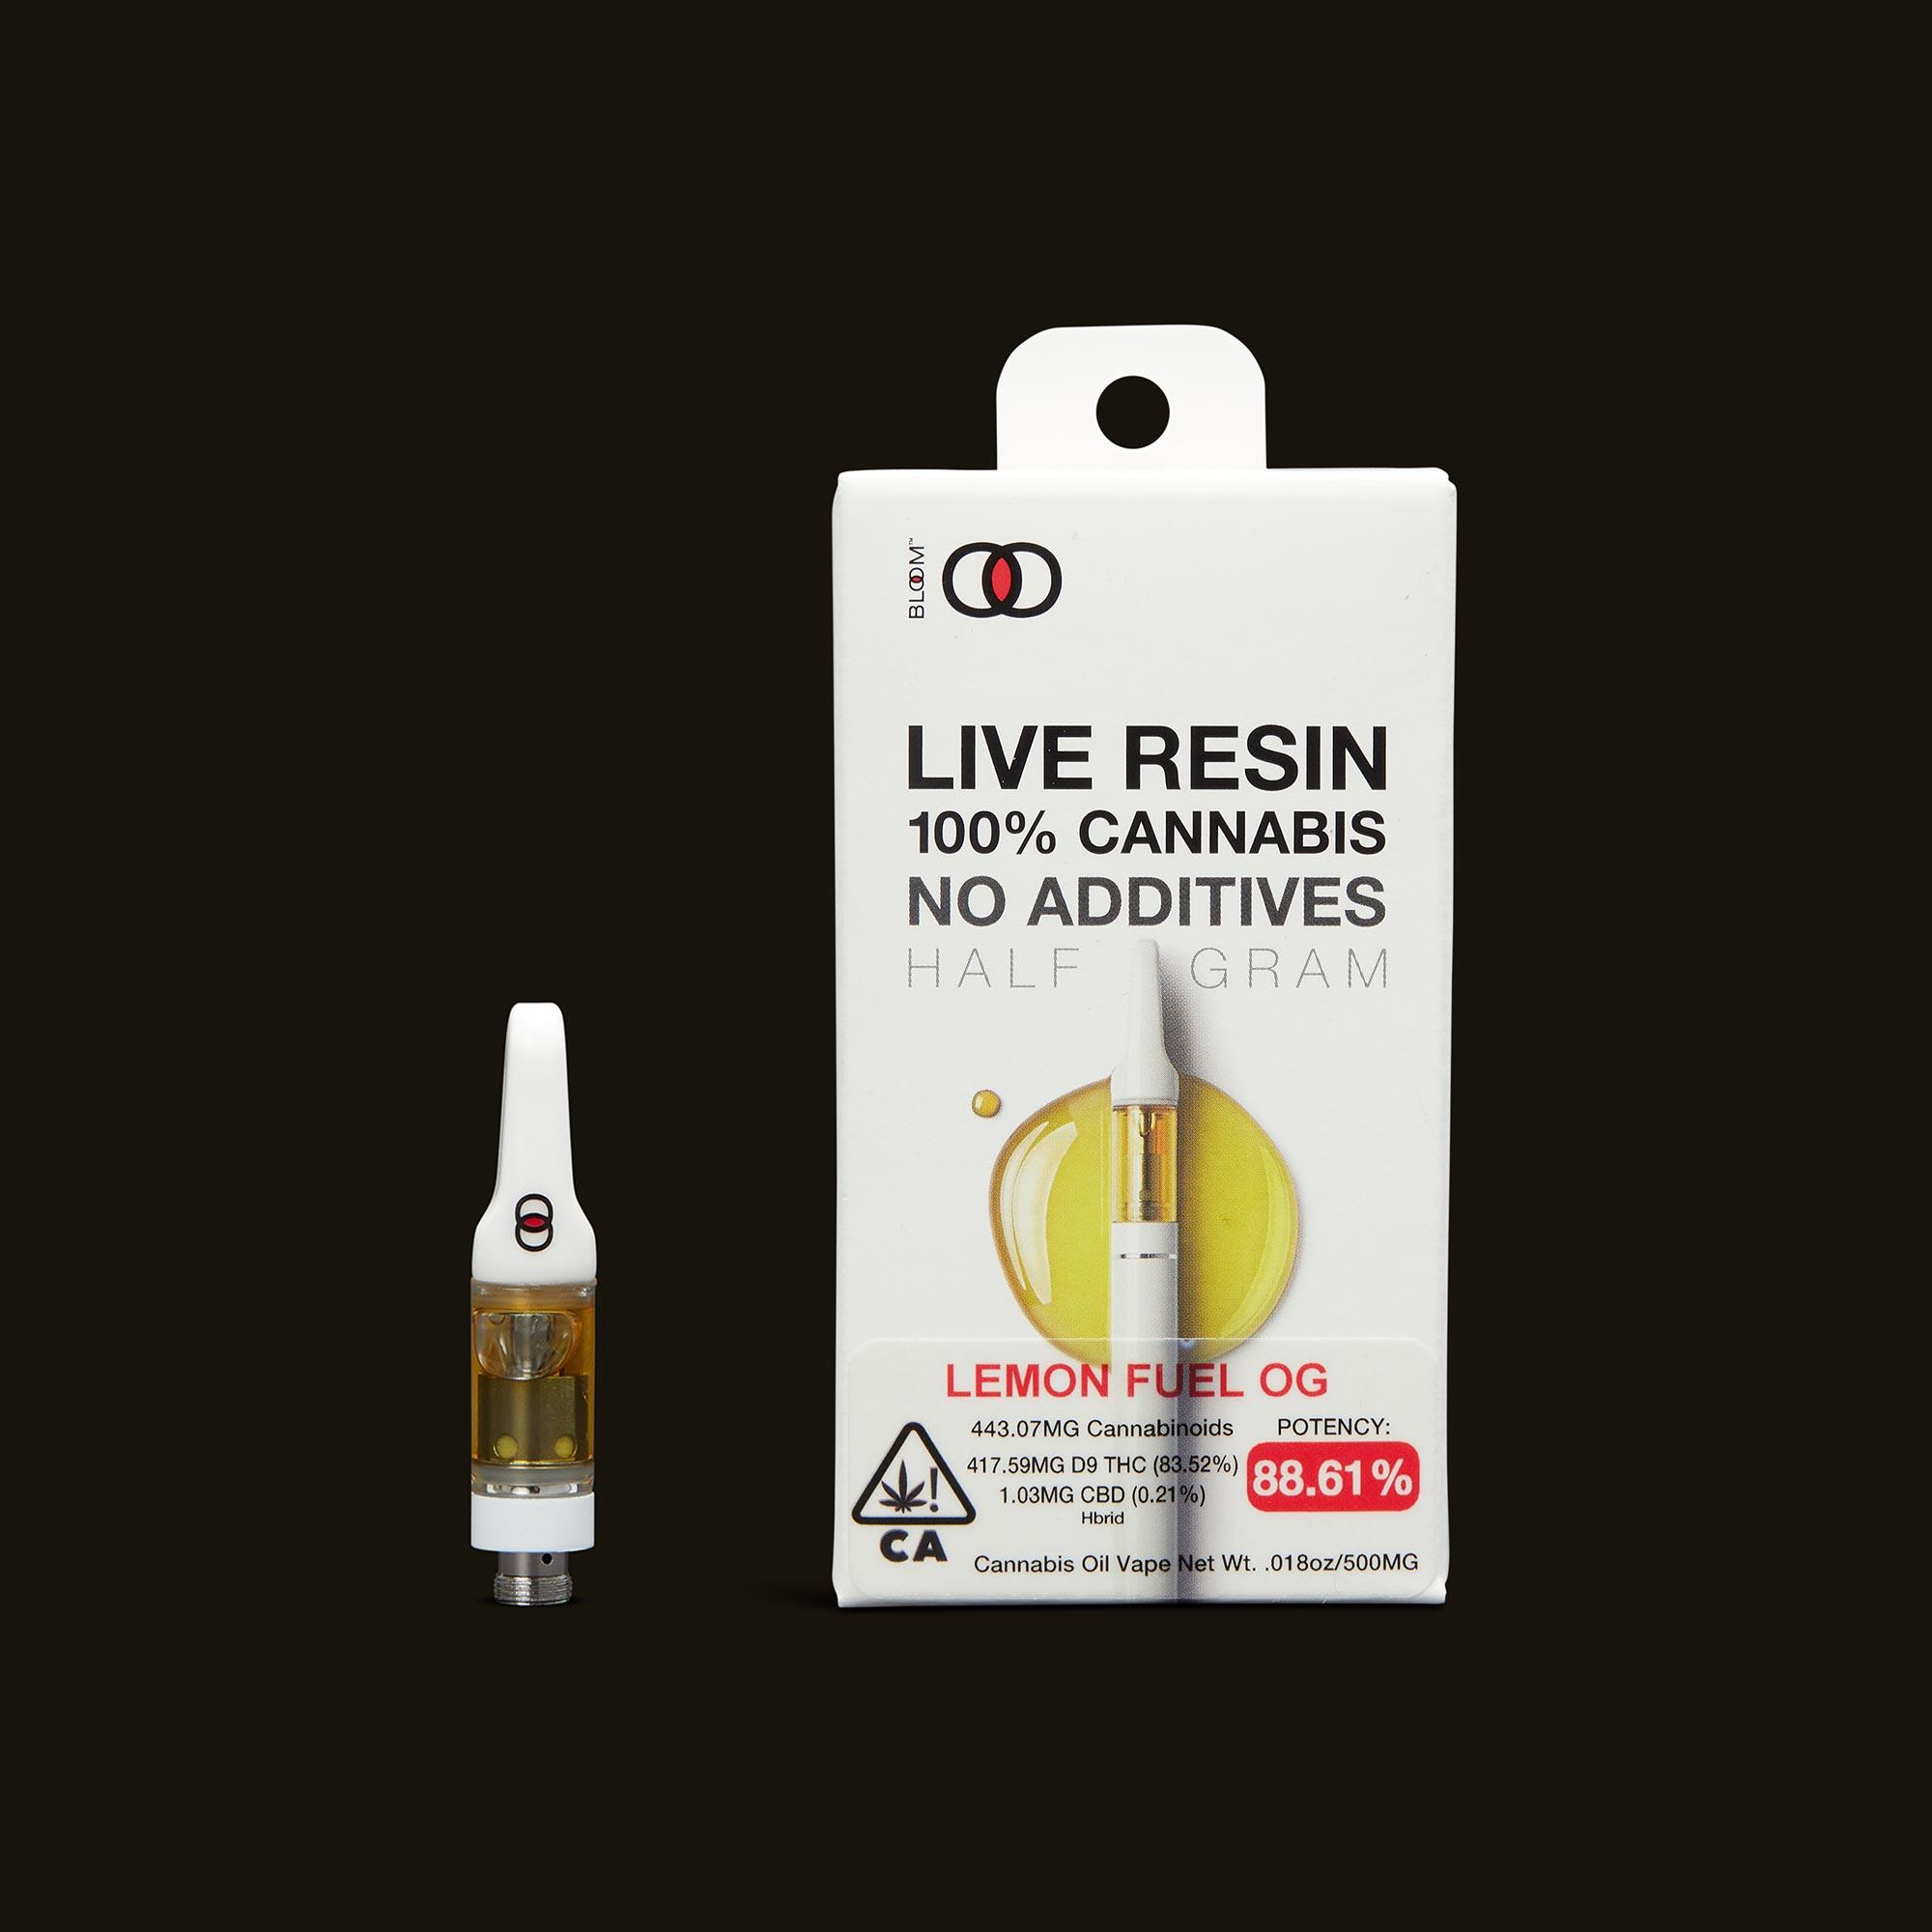 Bloom Brands Lemon Fuel OG Live Resin Cartridge - .5g